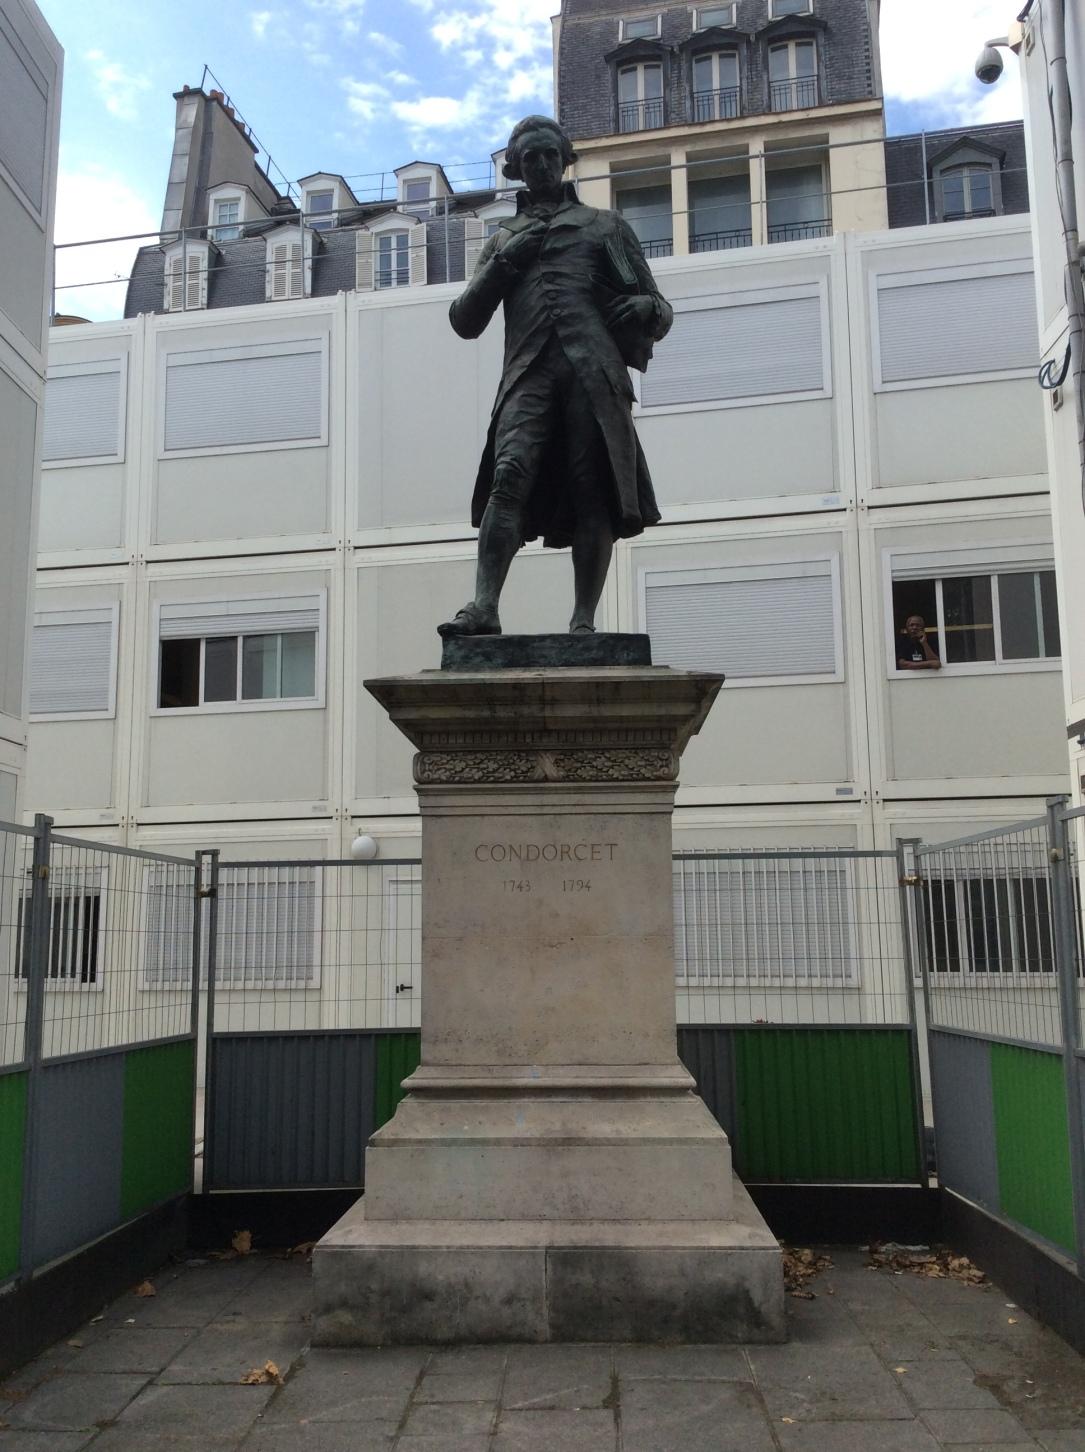 Statue of Condorcet on the Quai de Conti, France, Photo 2015 by Amy Cools